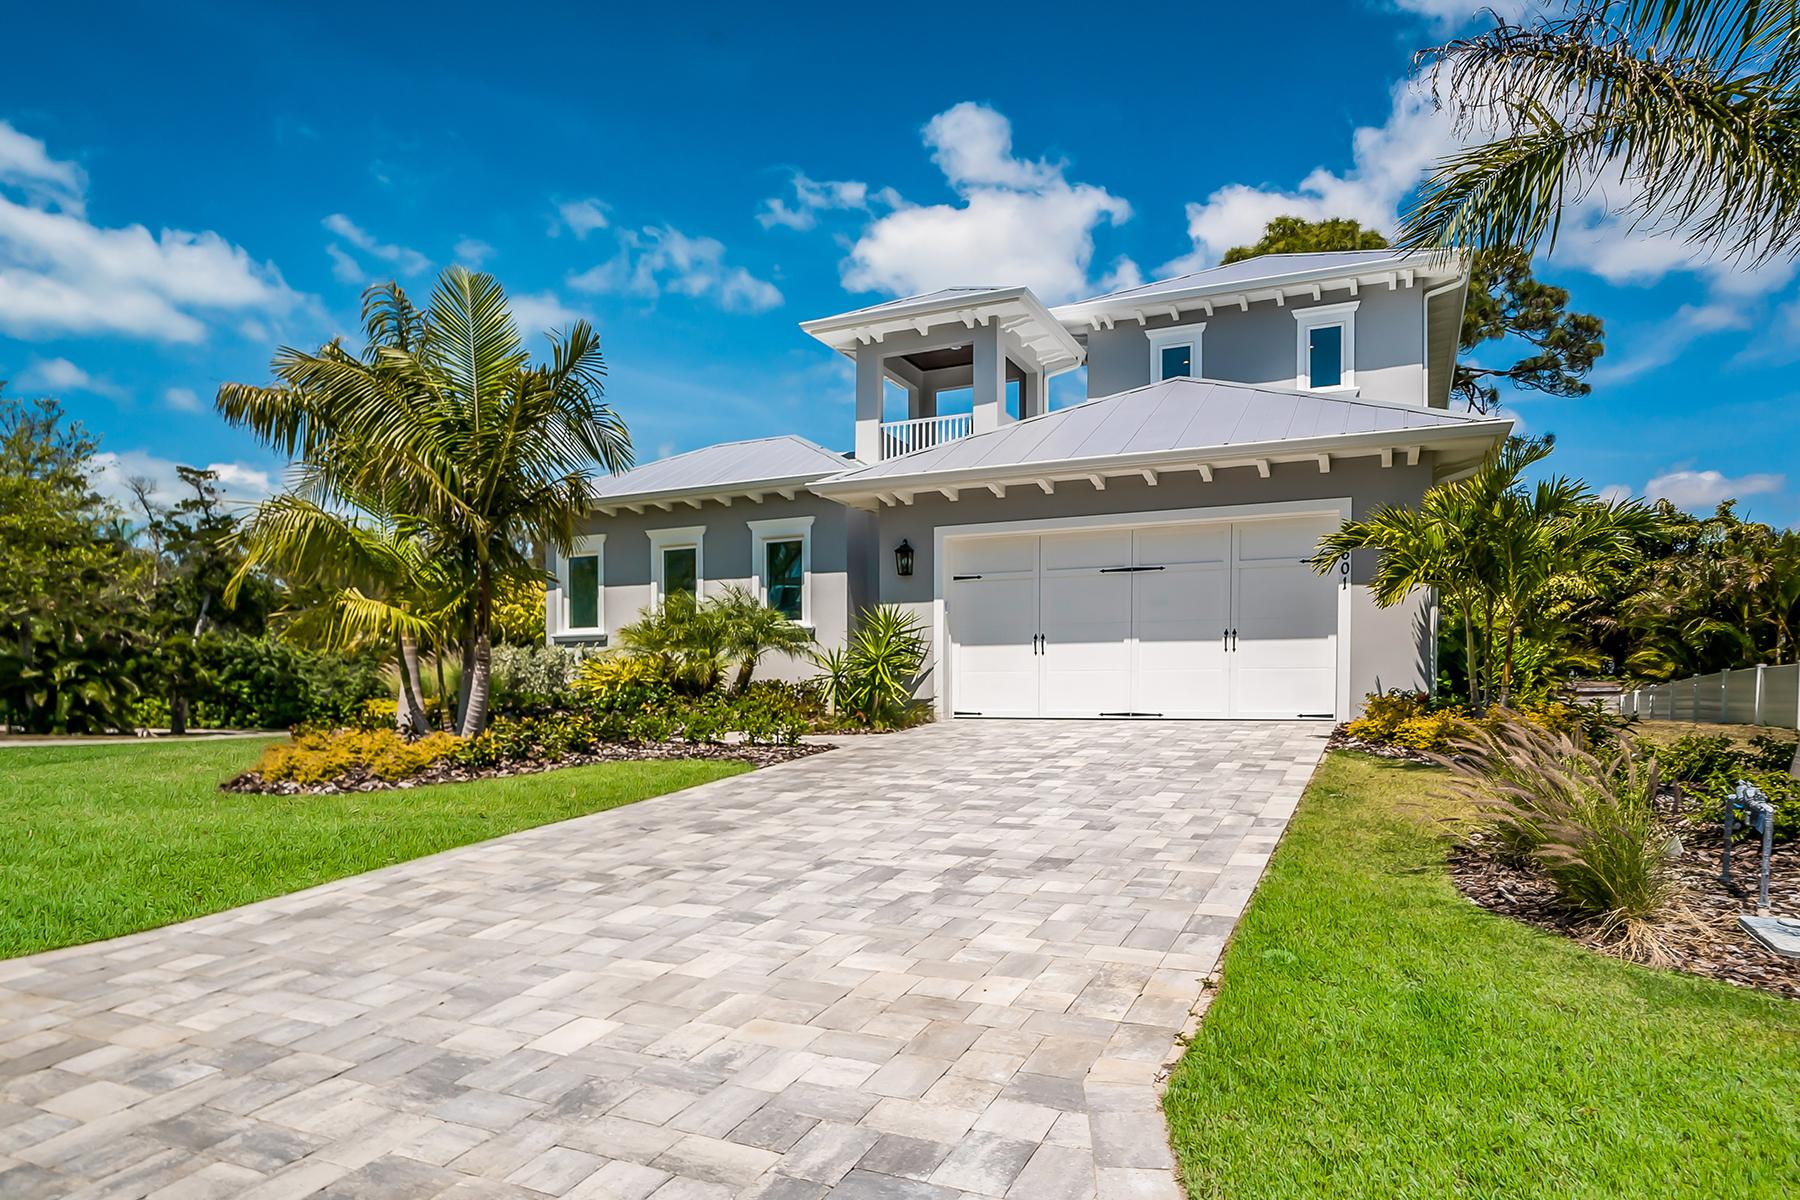 Single Family Home for Sale at LONGBOAT KEY 601 Triton, Longboat Key, Florida 34228 United States